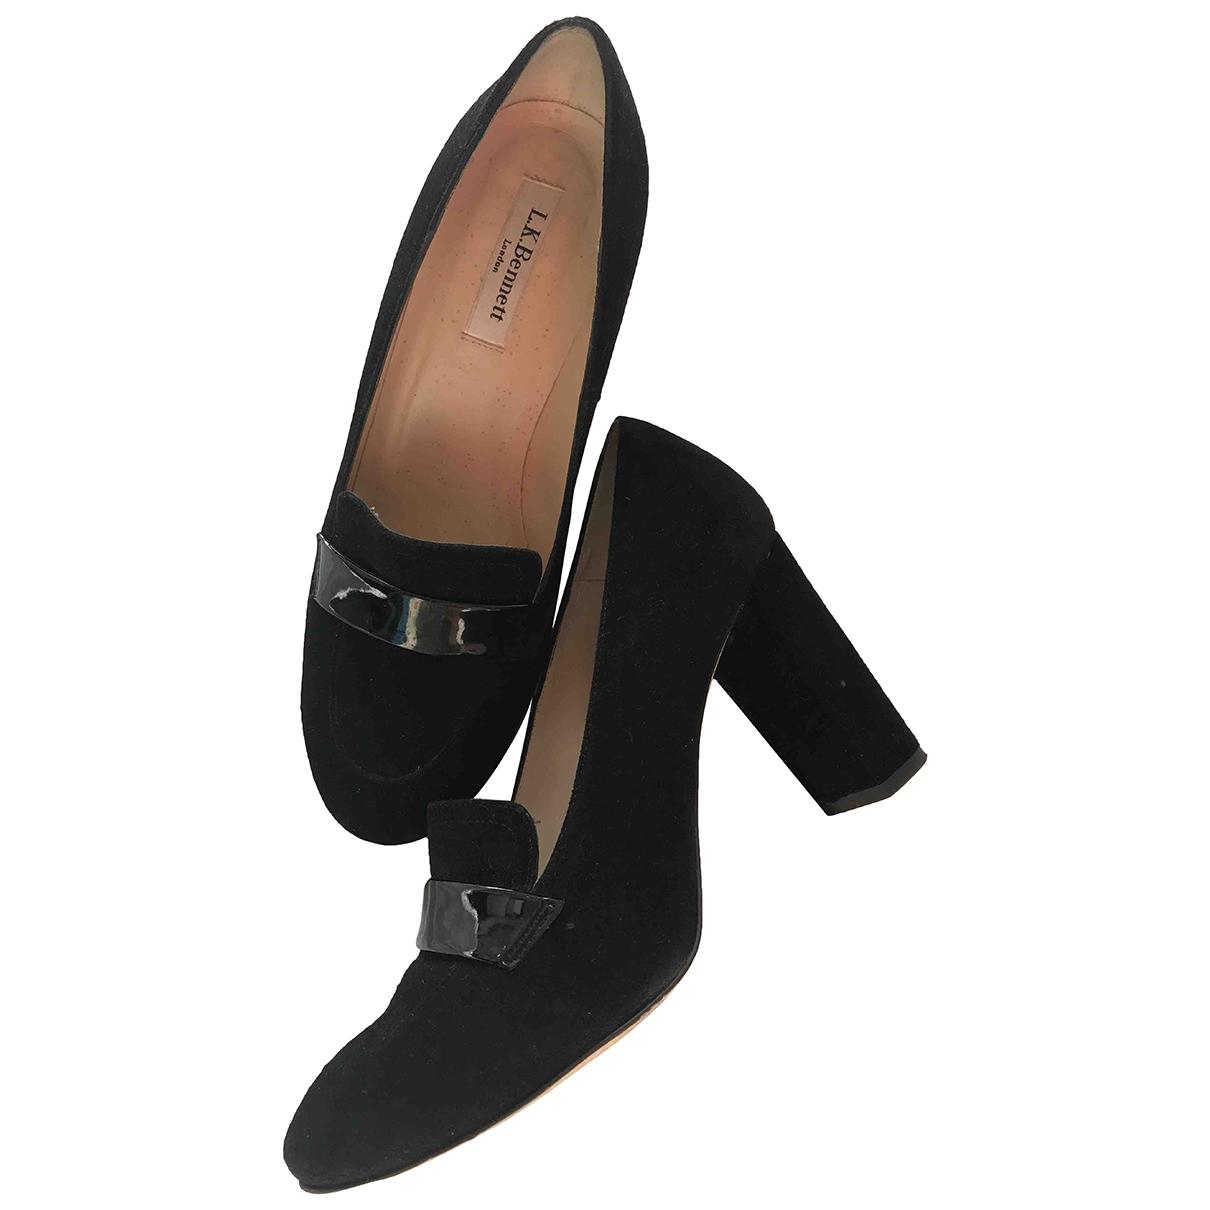 Lk Bennett \N Black Leather Heels for Women 39 EU